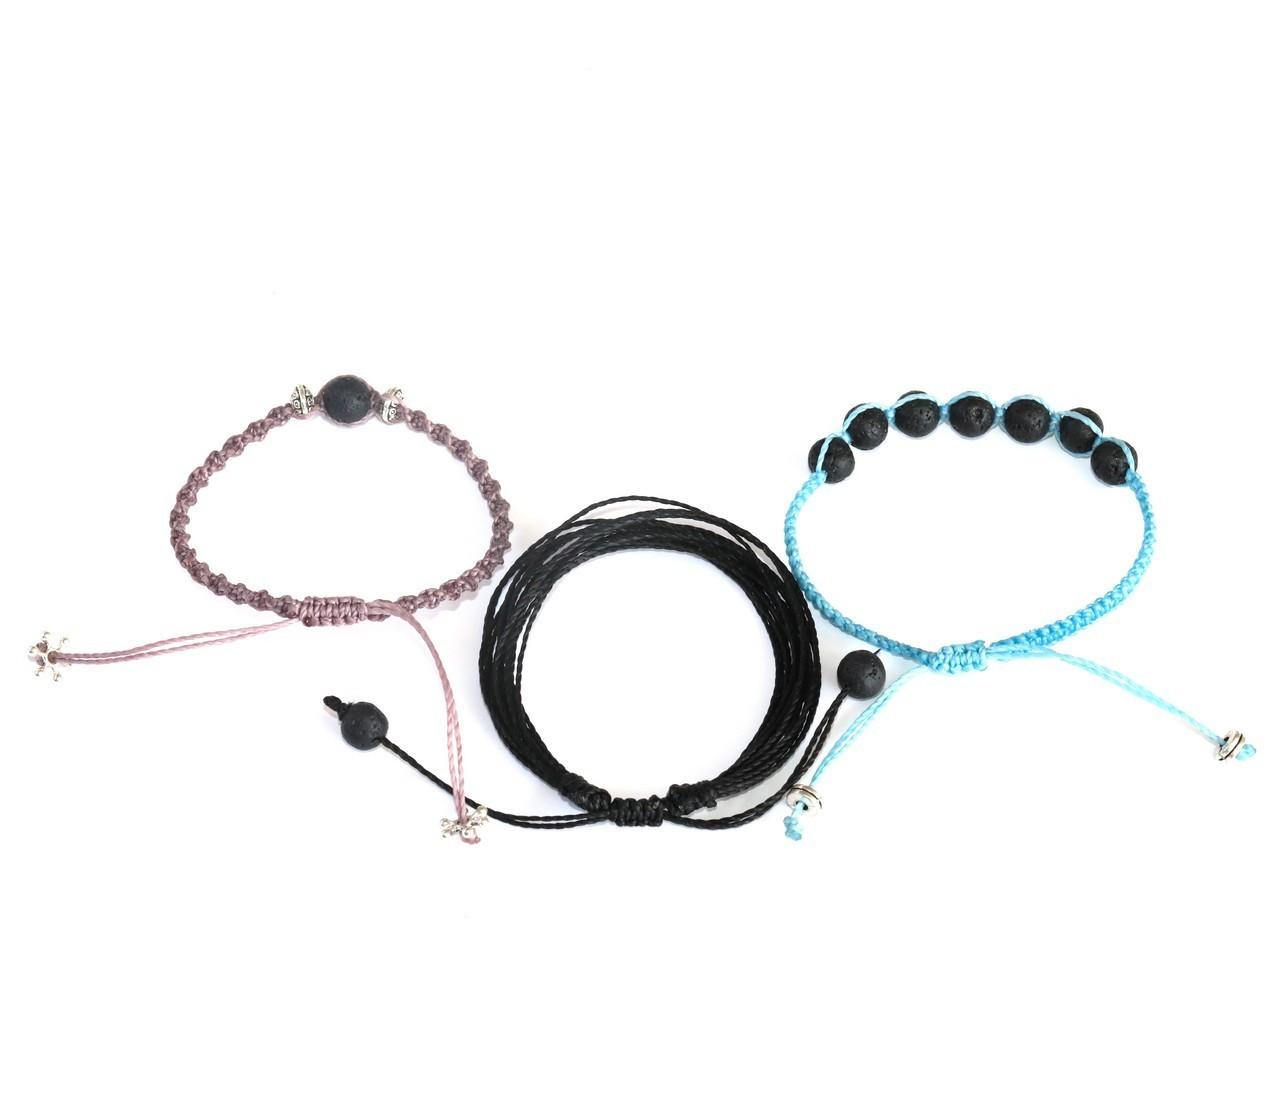 Wisdom Diffuser Bracelets